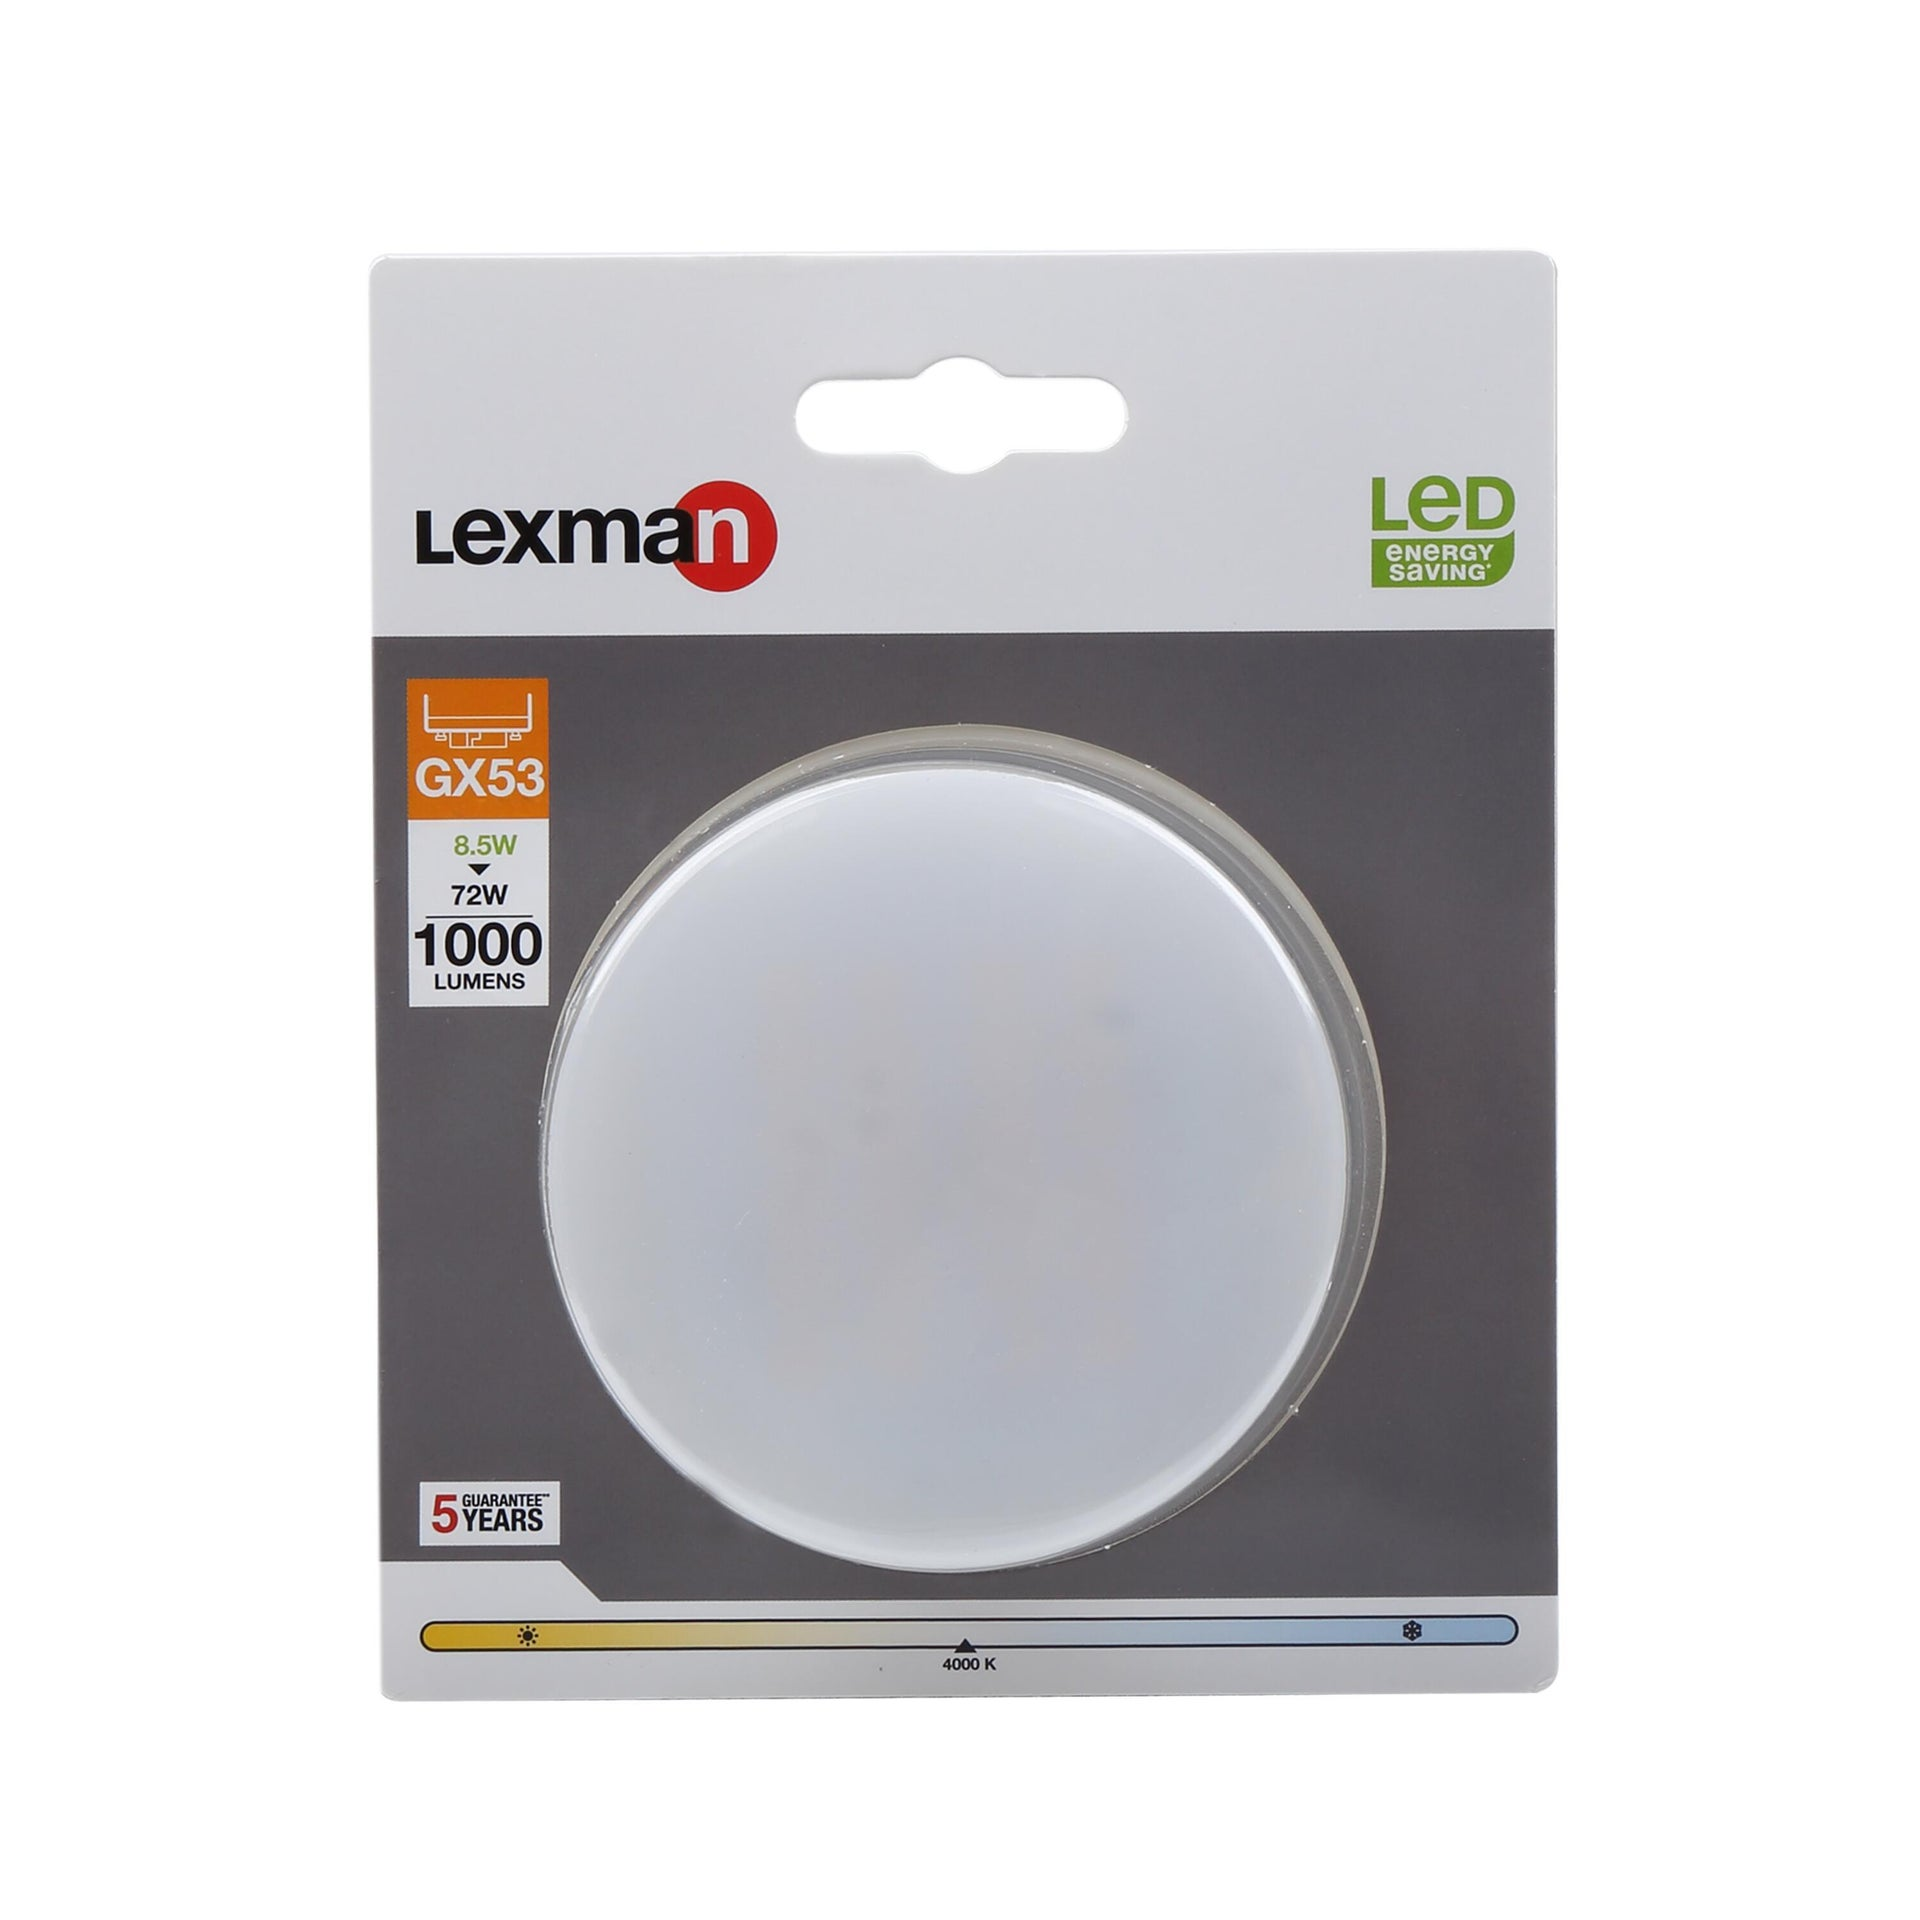 Lampadina LED, GX53, Specifico, Opaco, Luce naturale, 8.5W=1000LM (equiv 75 W), 110° , LEXMAN - 4